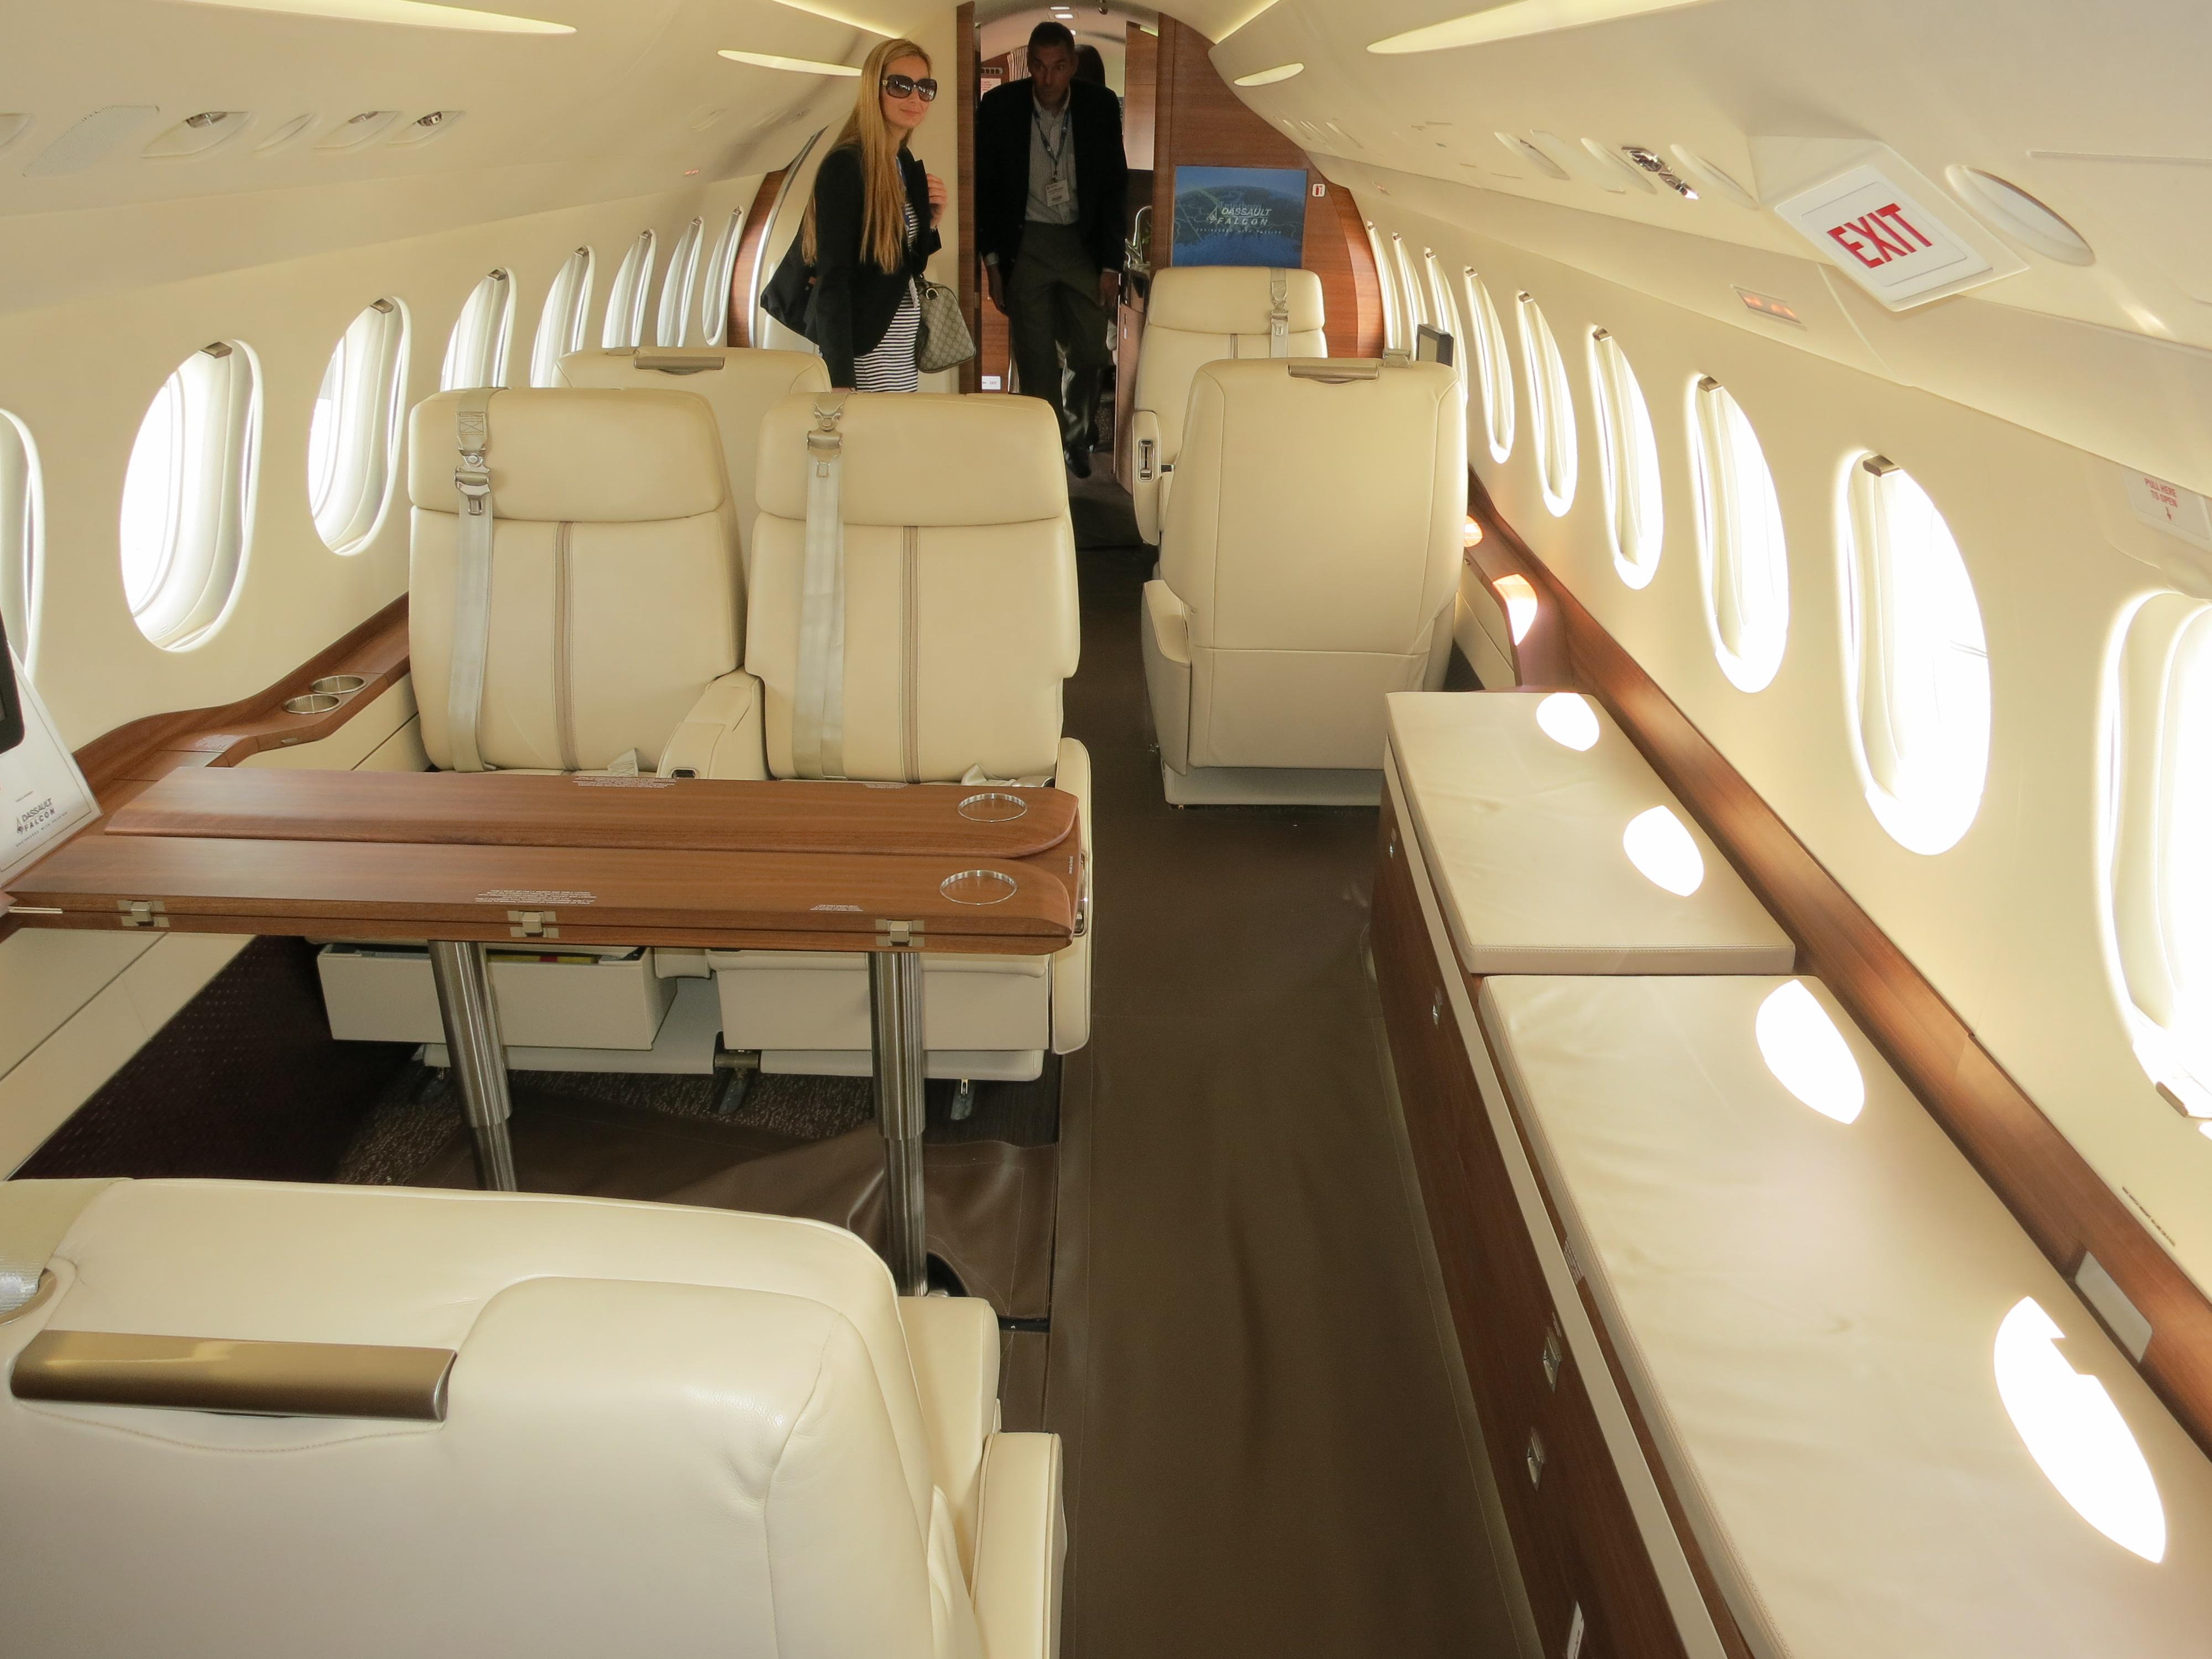 10 Bedroom House File Dassault Falcon 7x Forward Cabin Interior With